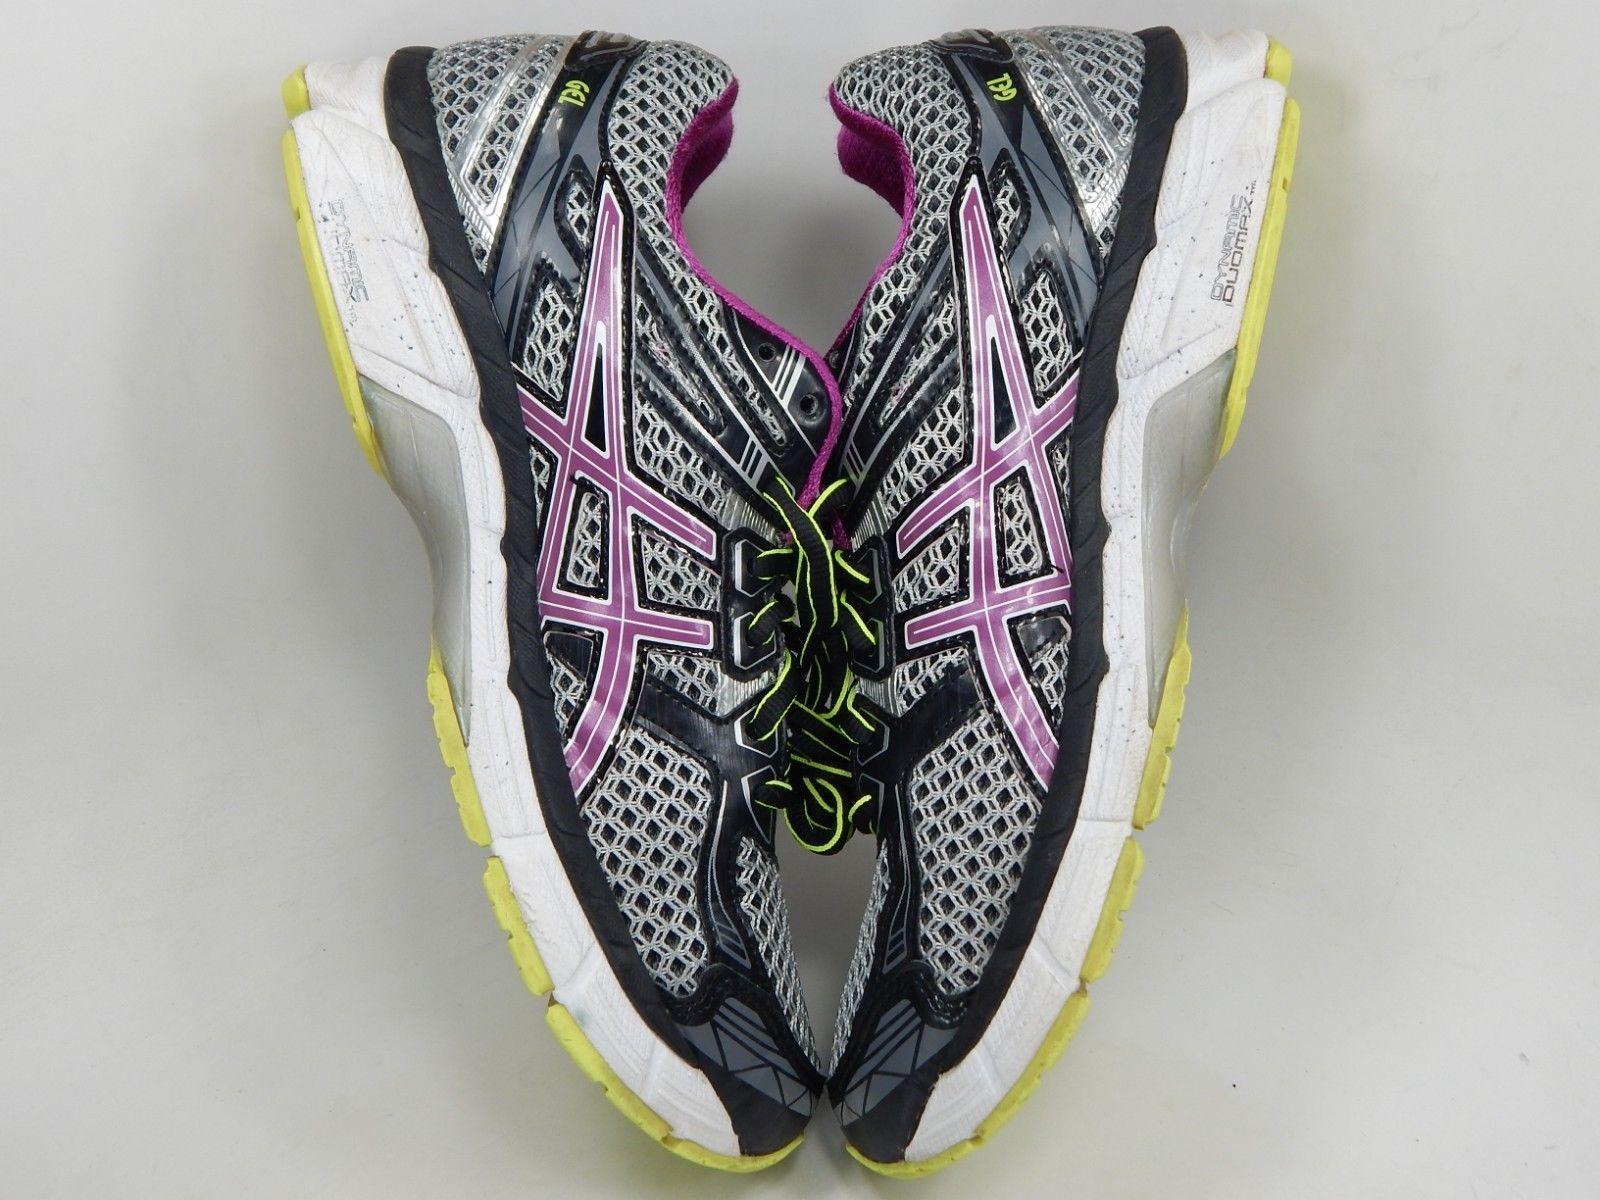 Asics GT 2000 v 2 Size: US 9 M (B) EU 40.5 Women's Running Shoes Silver T3P8N